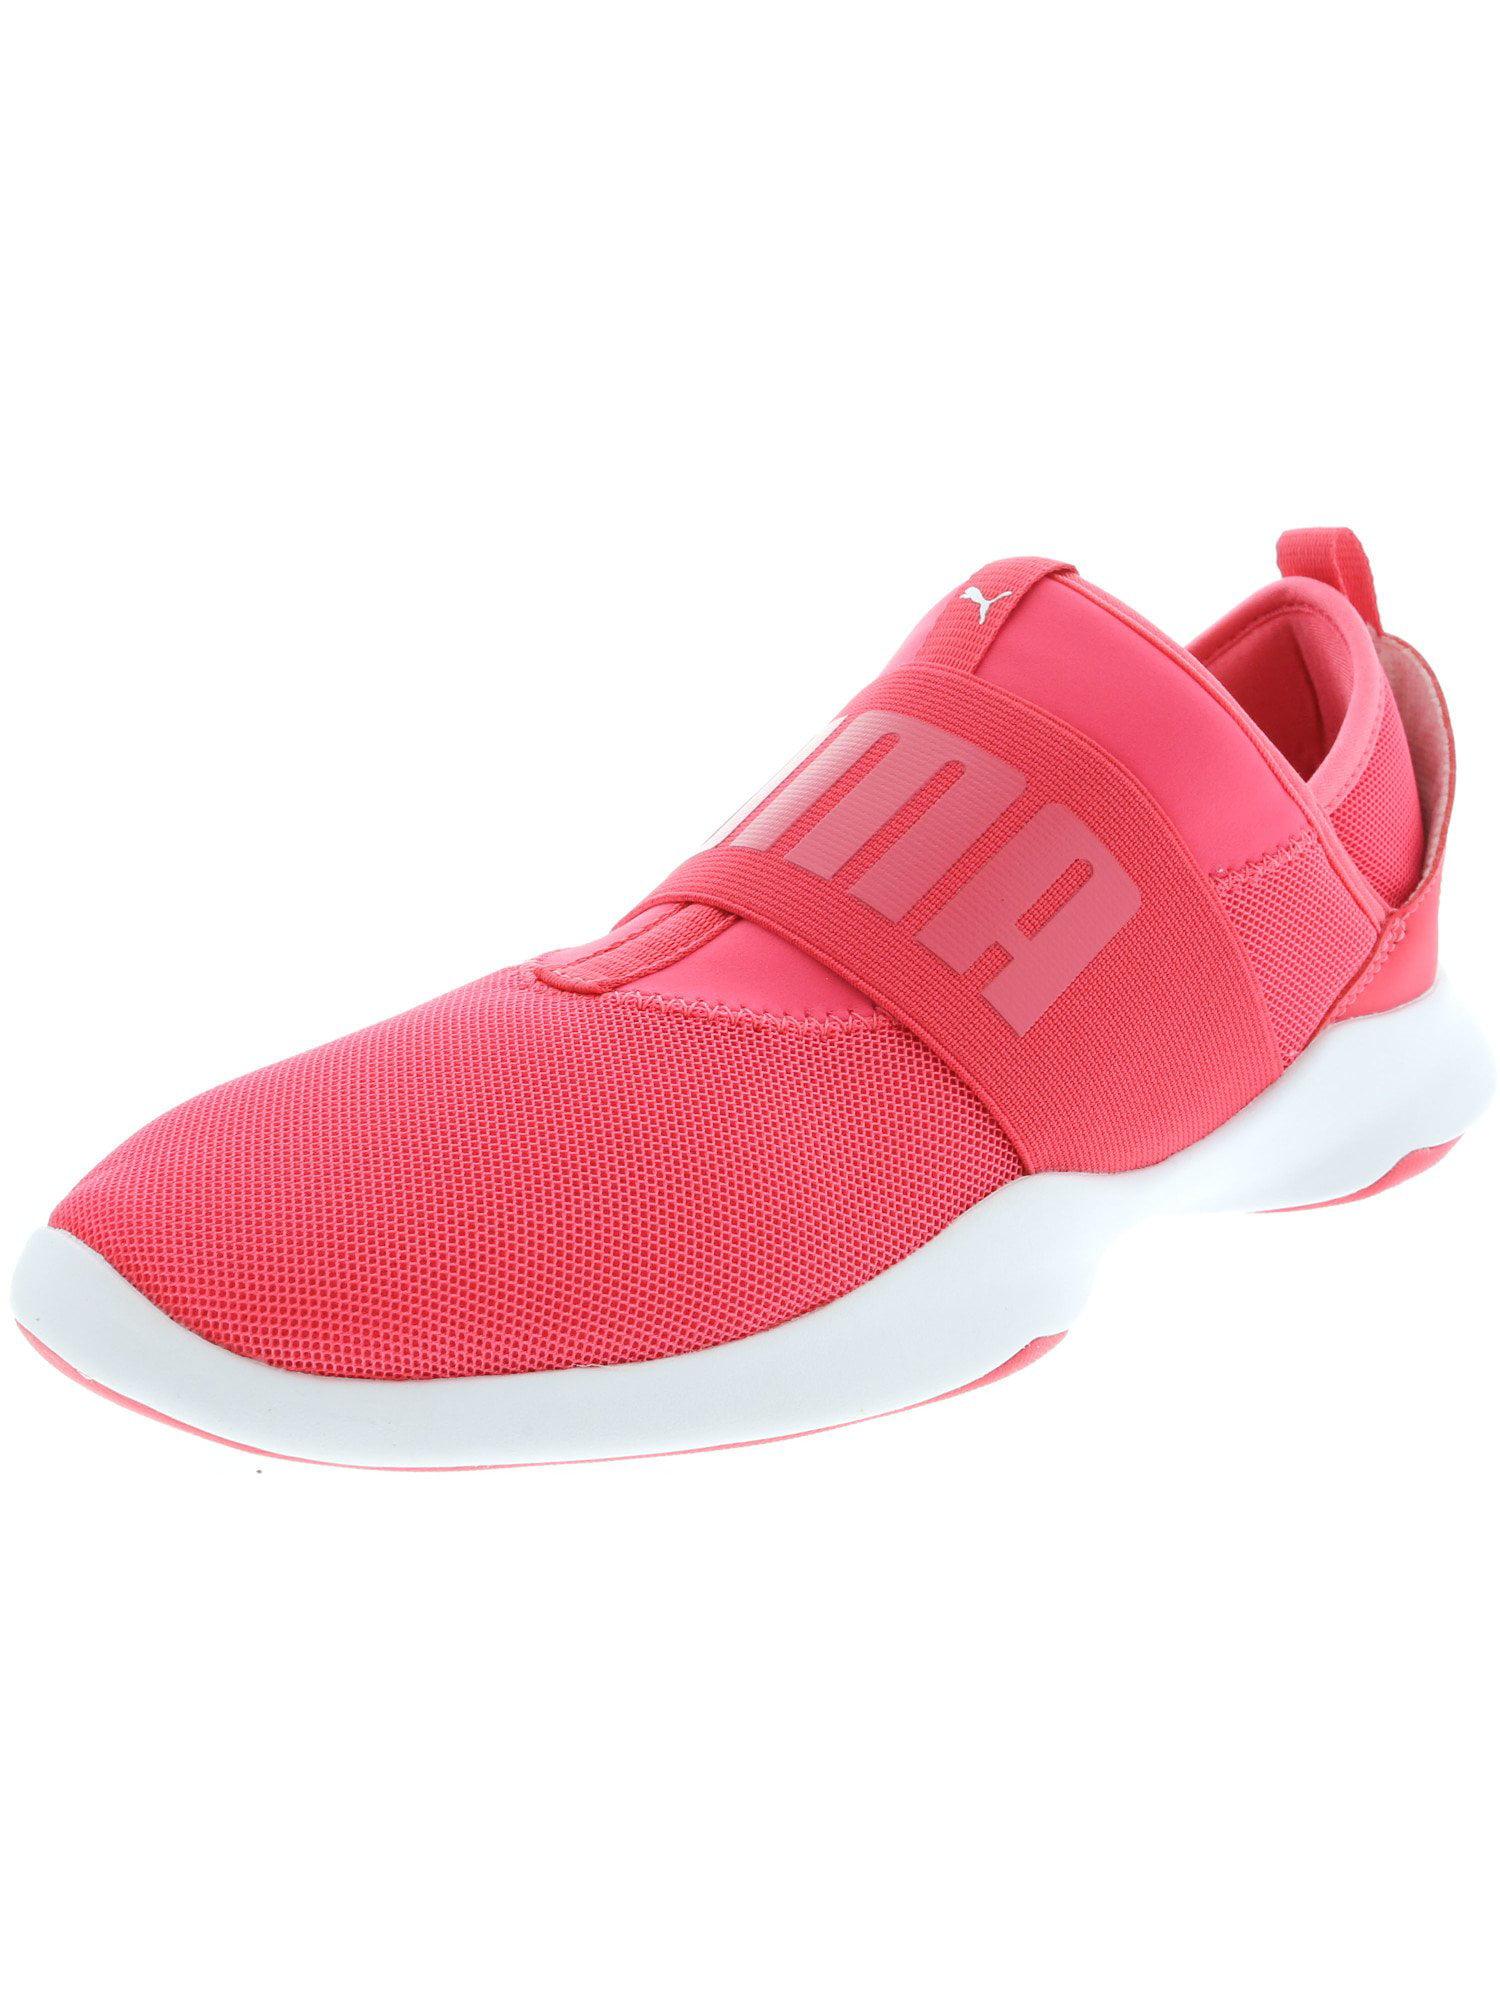 Puma Dare Training Sneaker - 9M